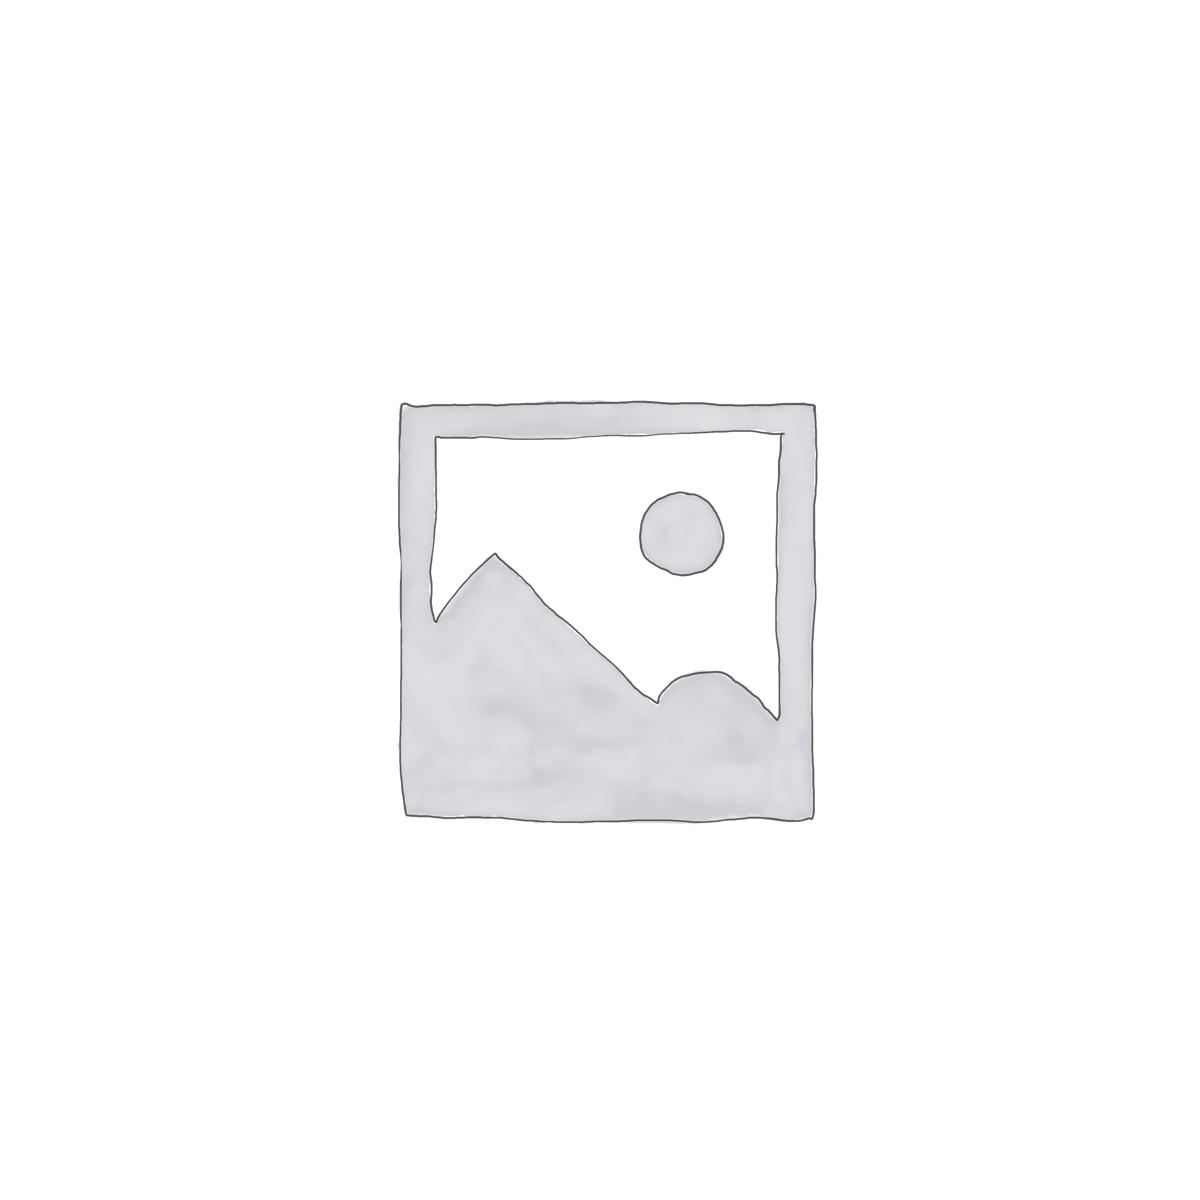 woocommerce-placeholder Fullscreen Fashion